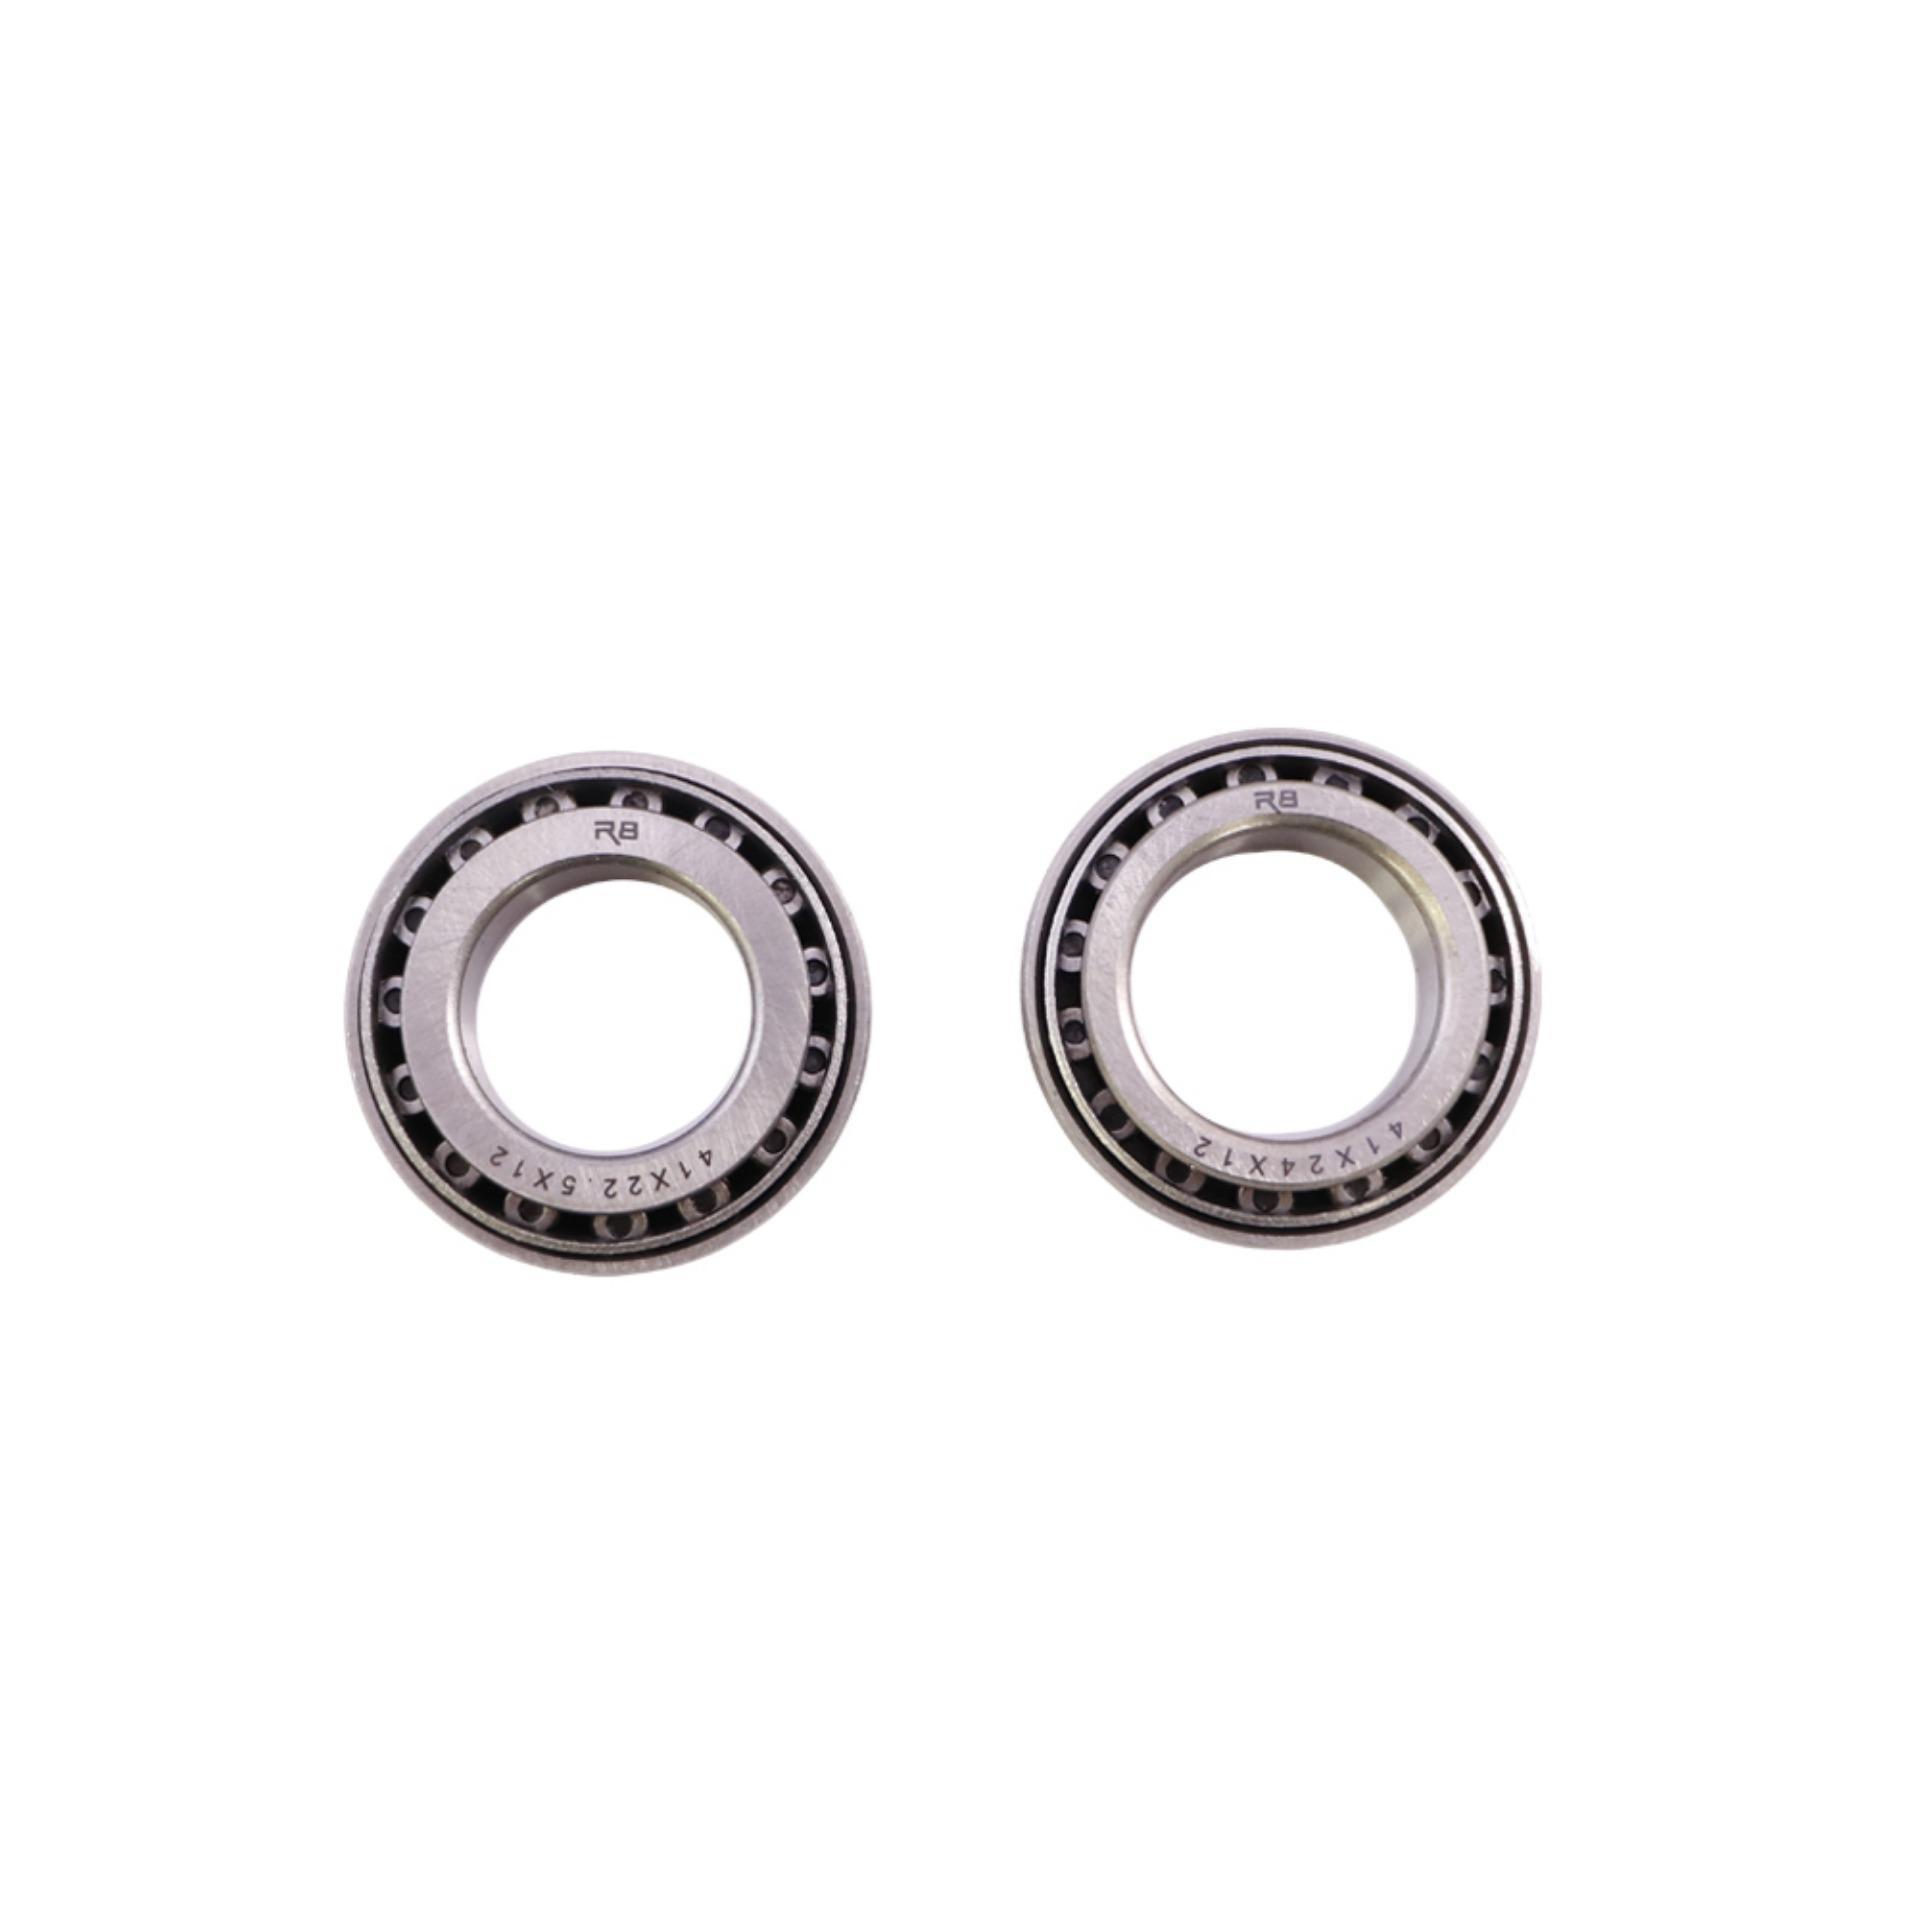 R8 Knuckle Bearing TMX125/155 ZGX (9856-105)